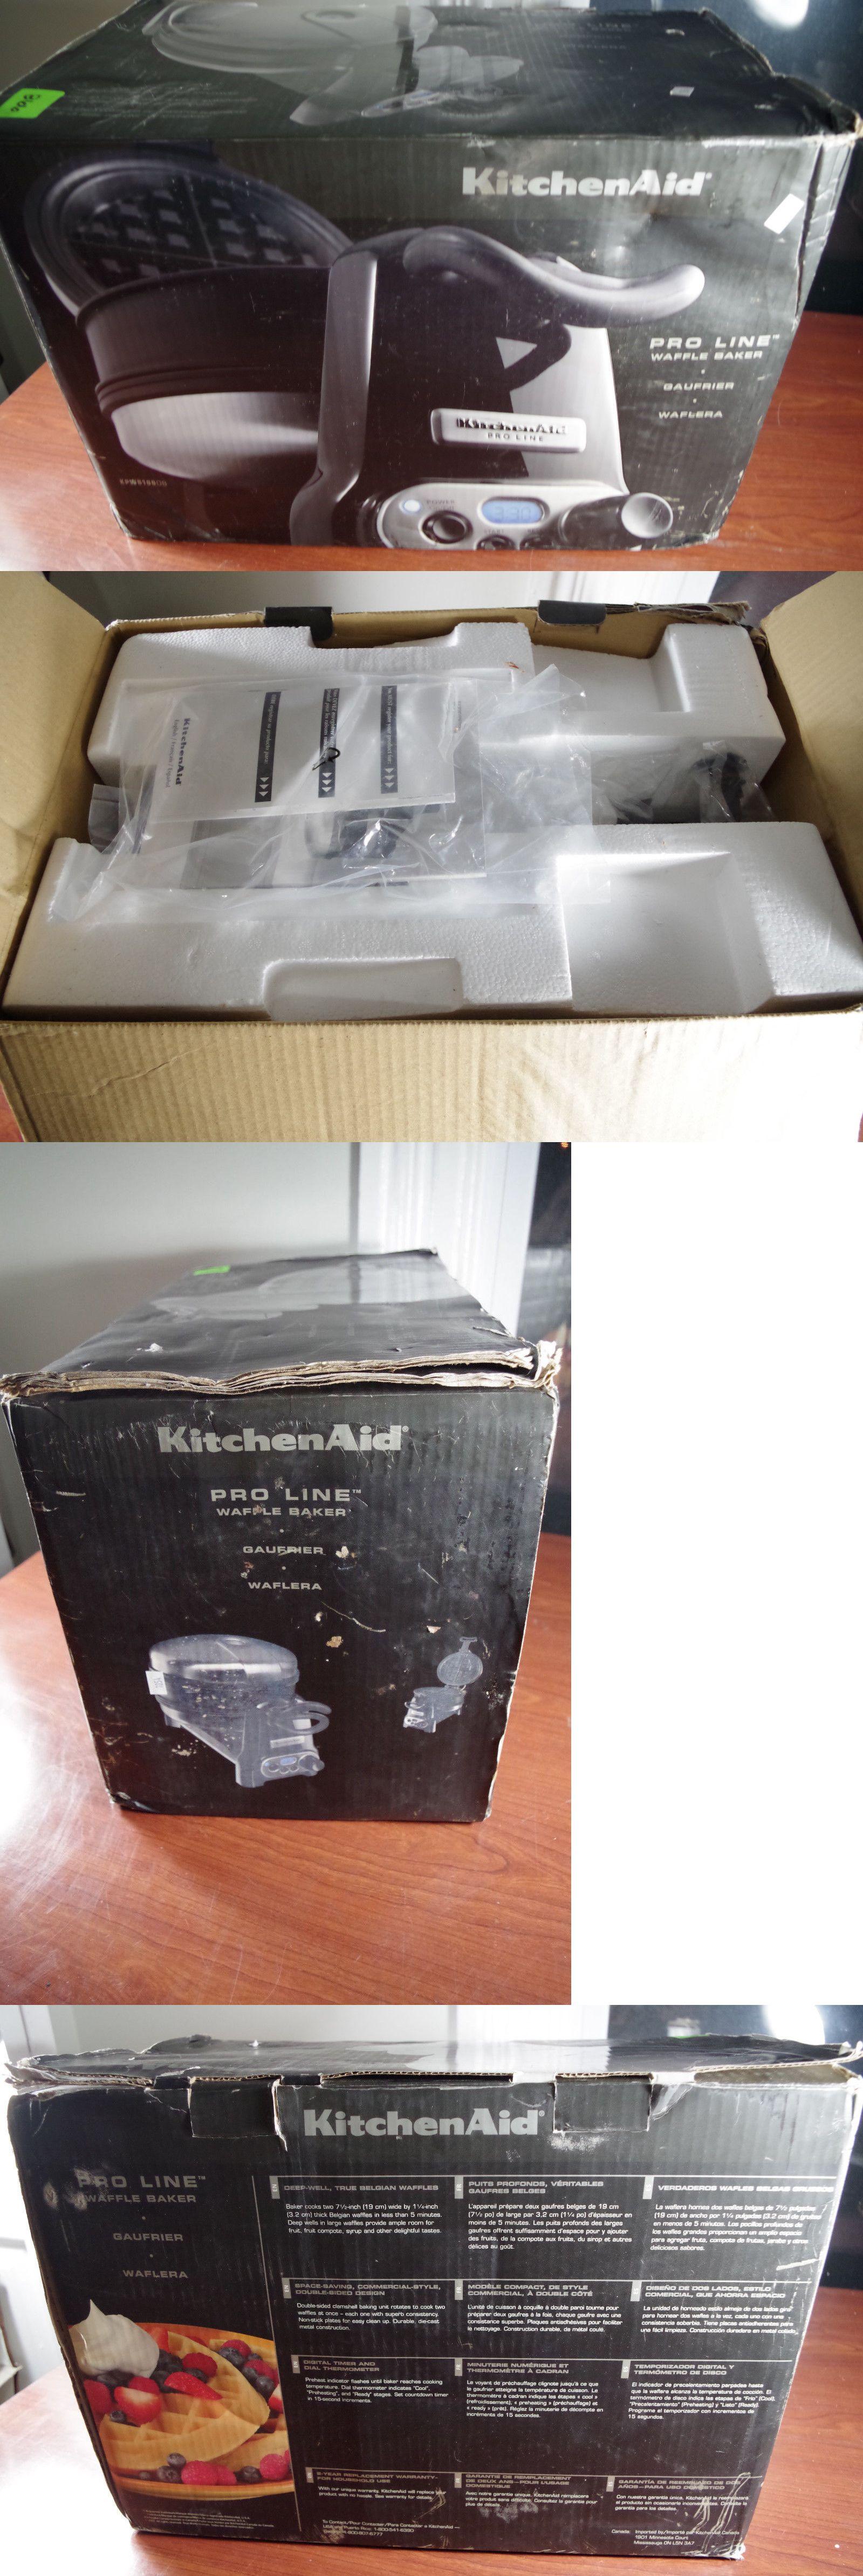 Kitchenaid pro line belgian waffle maker baker kpwb100 new